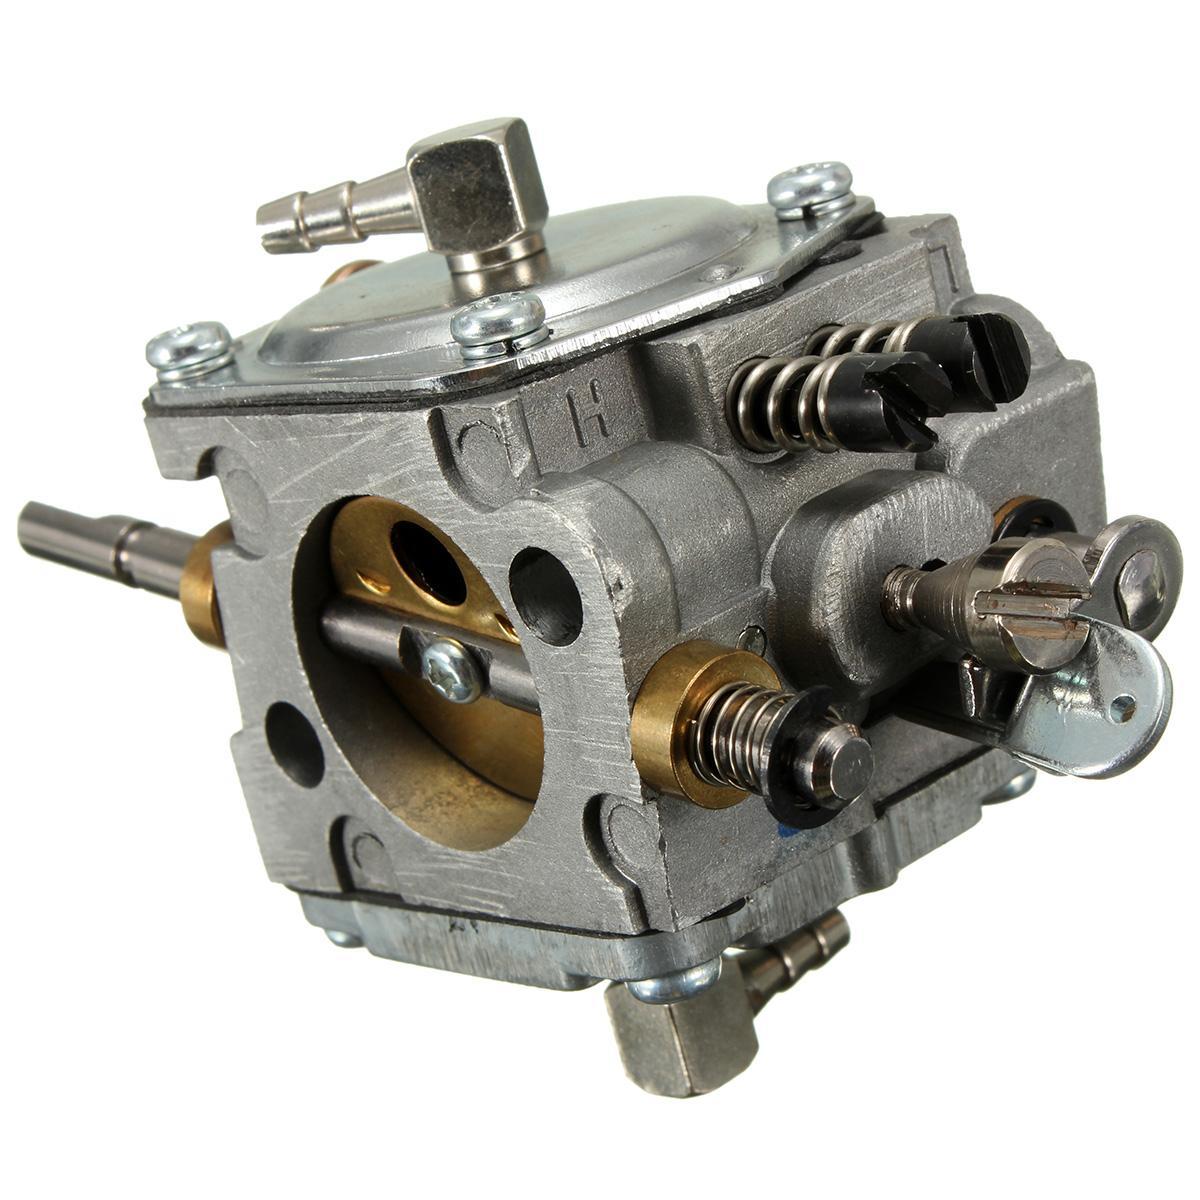 New Carburetor Carb For STIHL TS400 Cut Off Saw 4223-120-0600 4223-120-0601